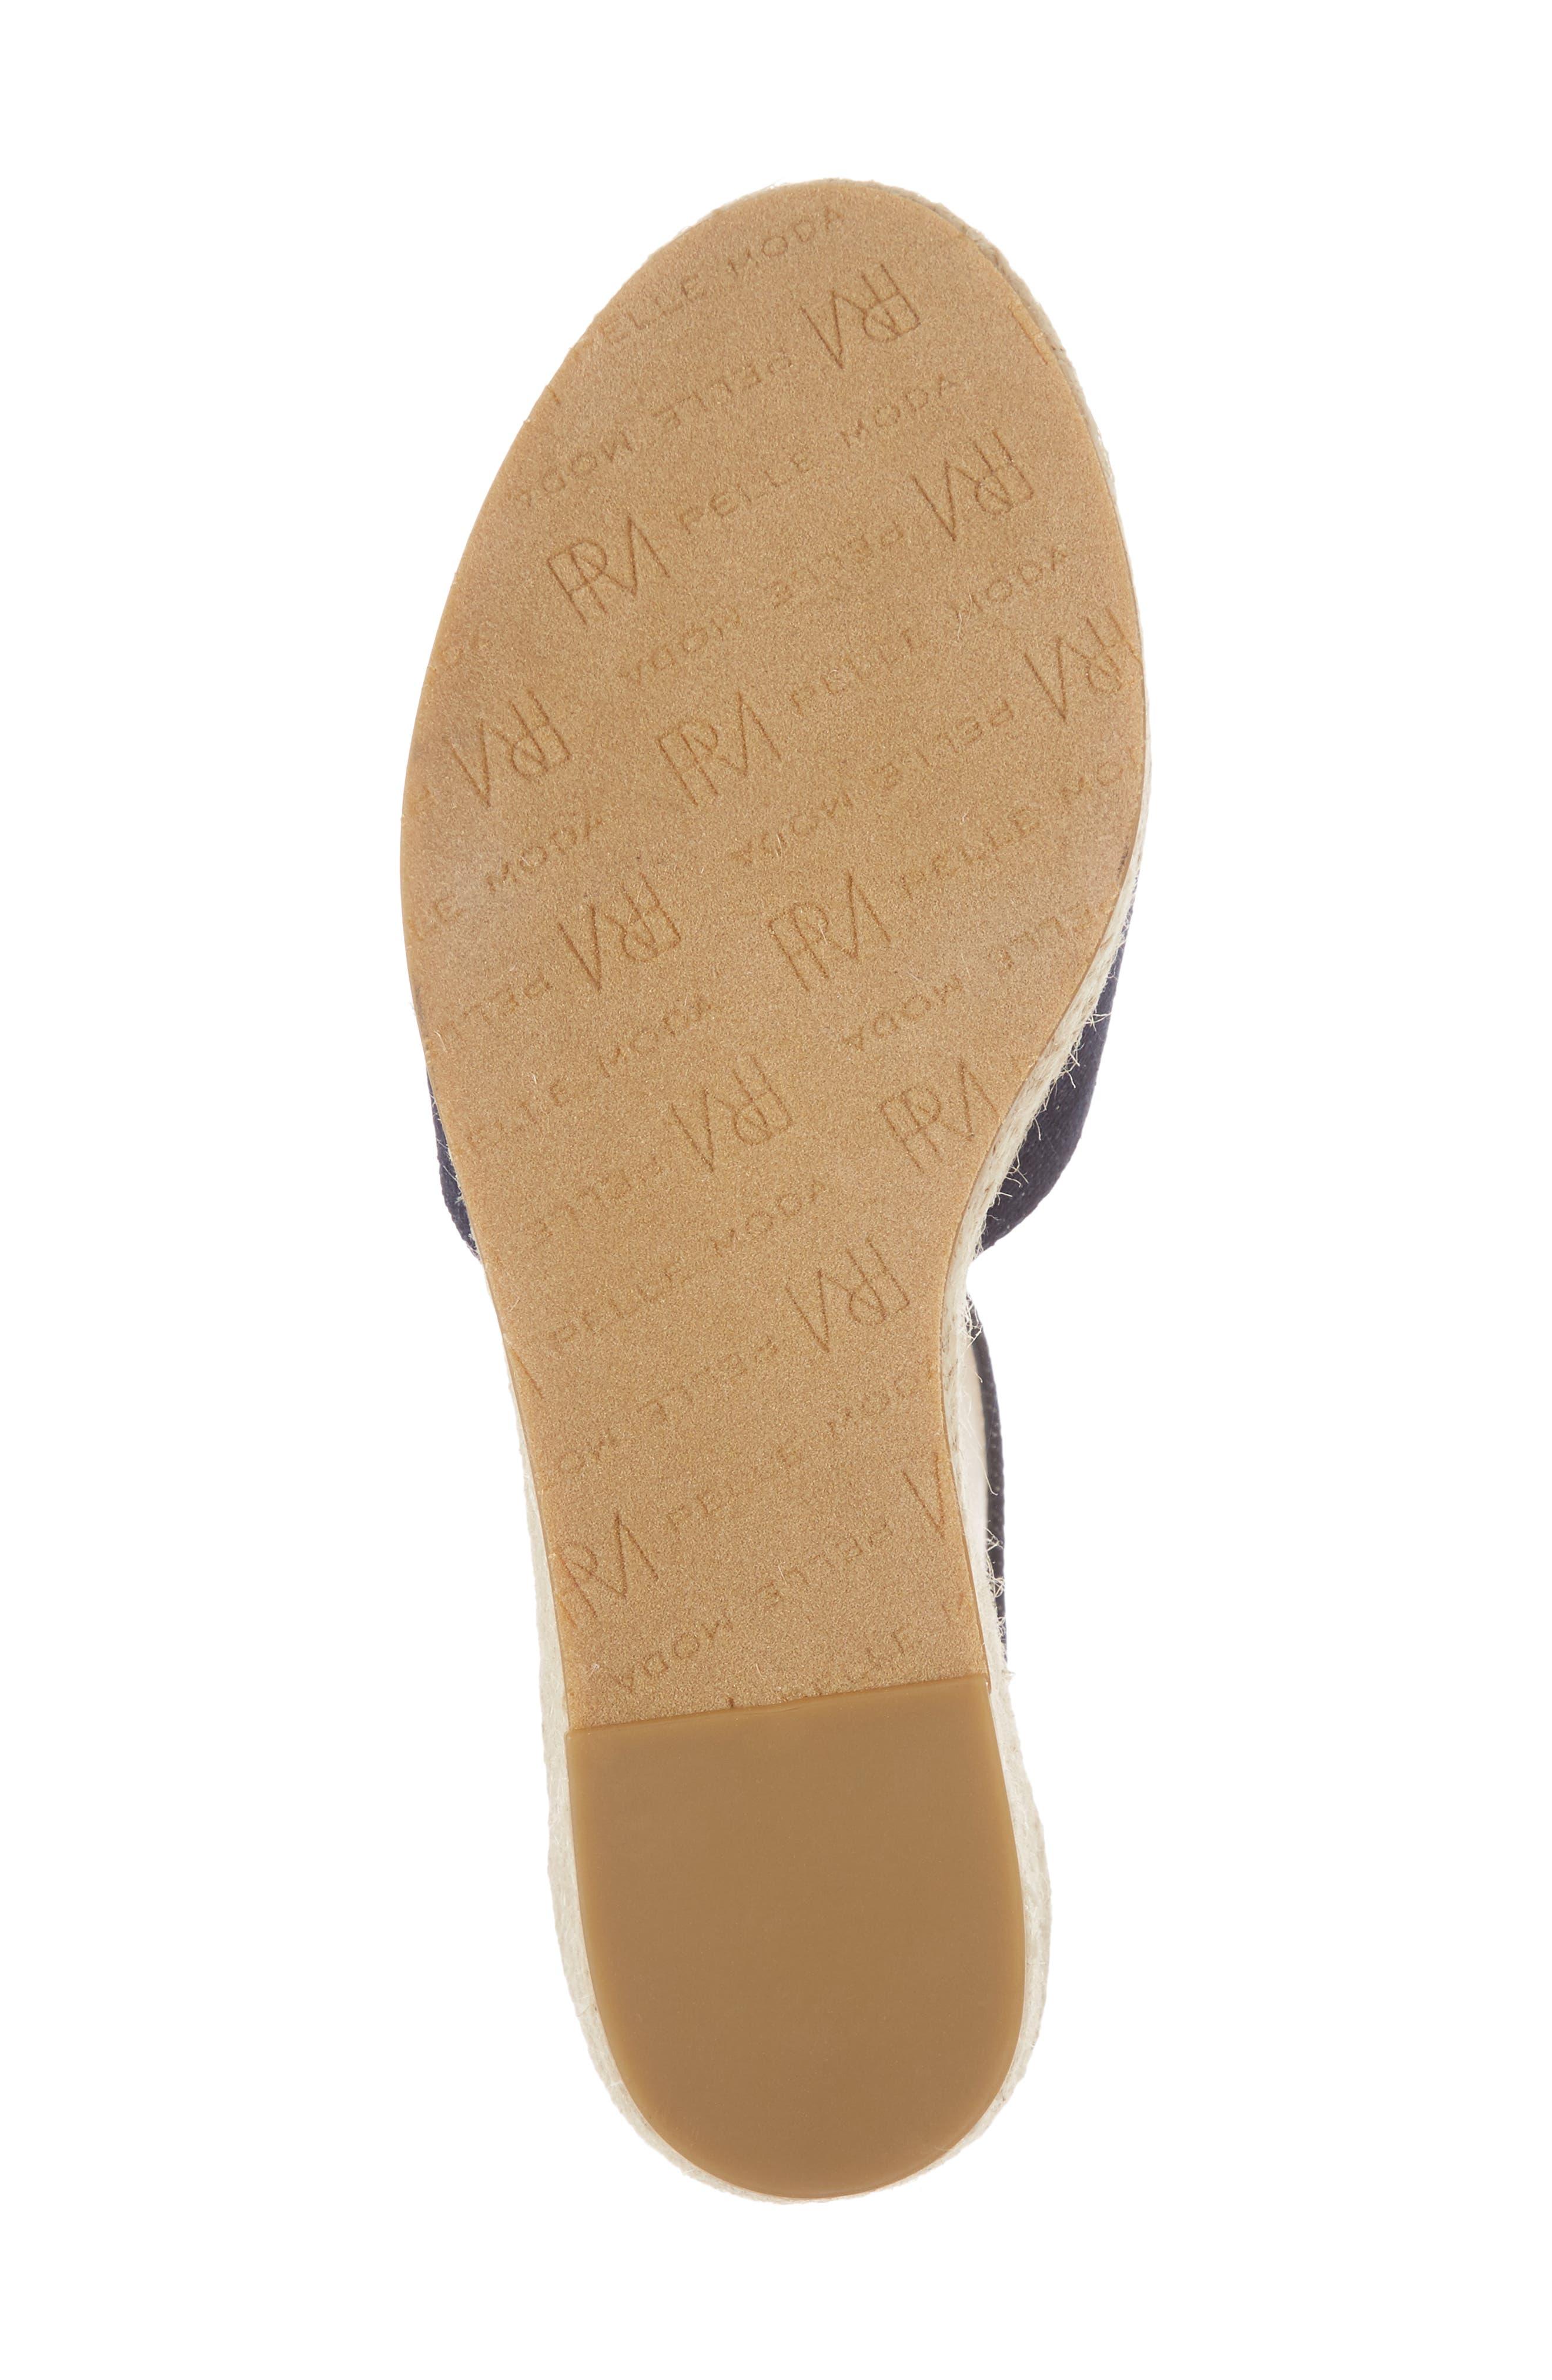 Kauai Platform Wedge Sandal,                             Alternate thumbnail 6, color,                             INDIGO